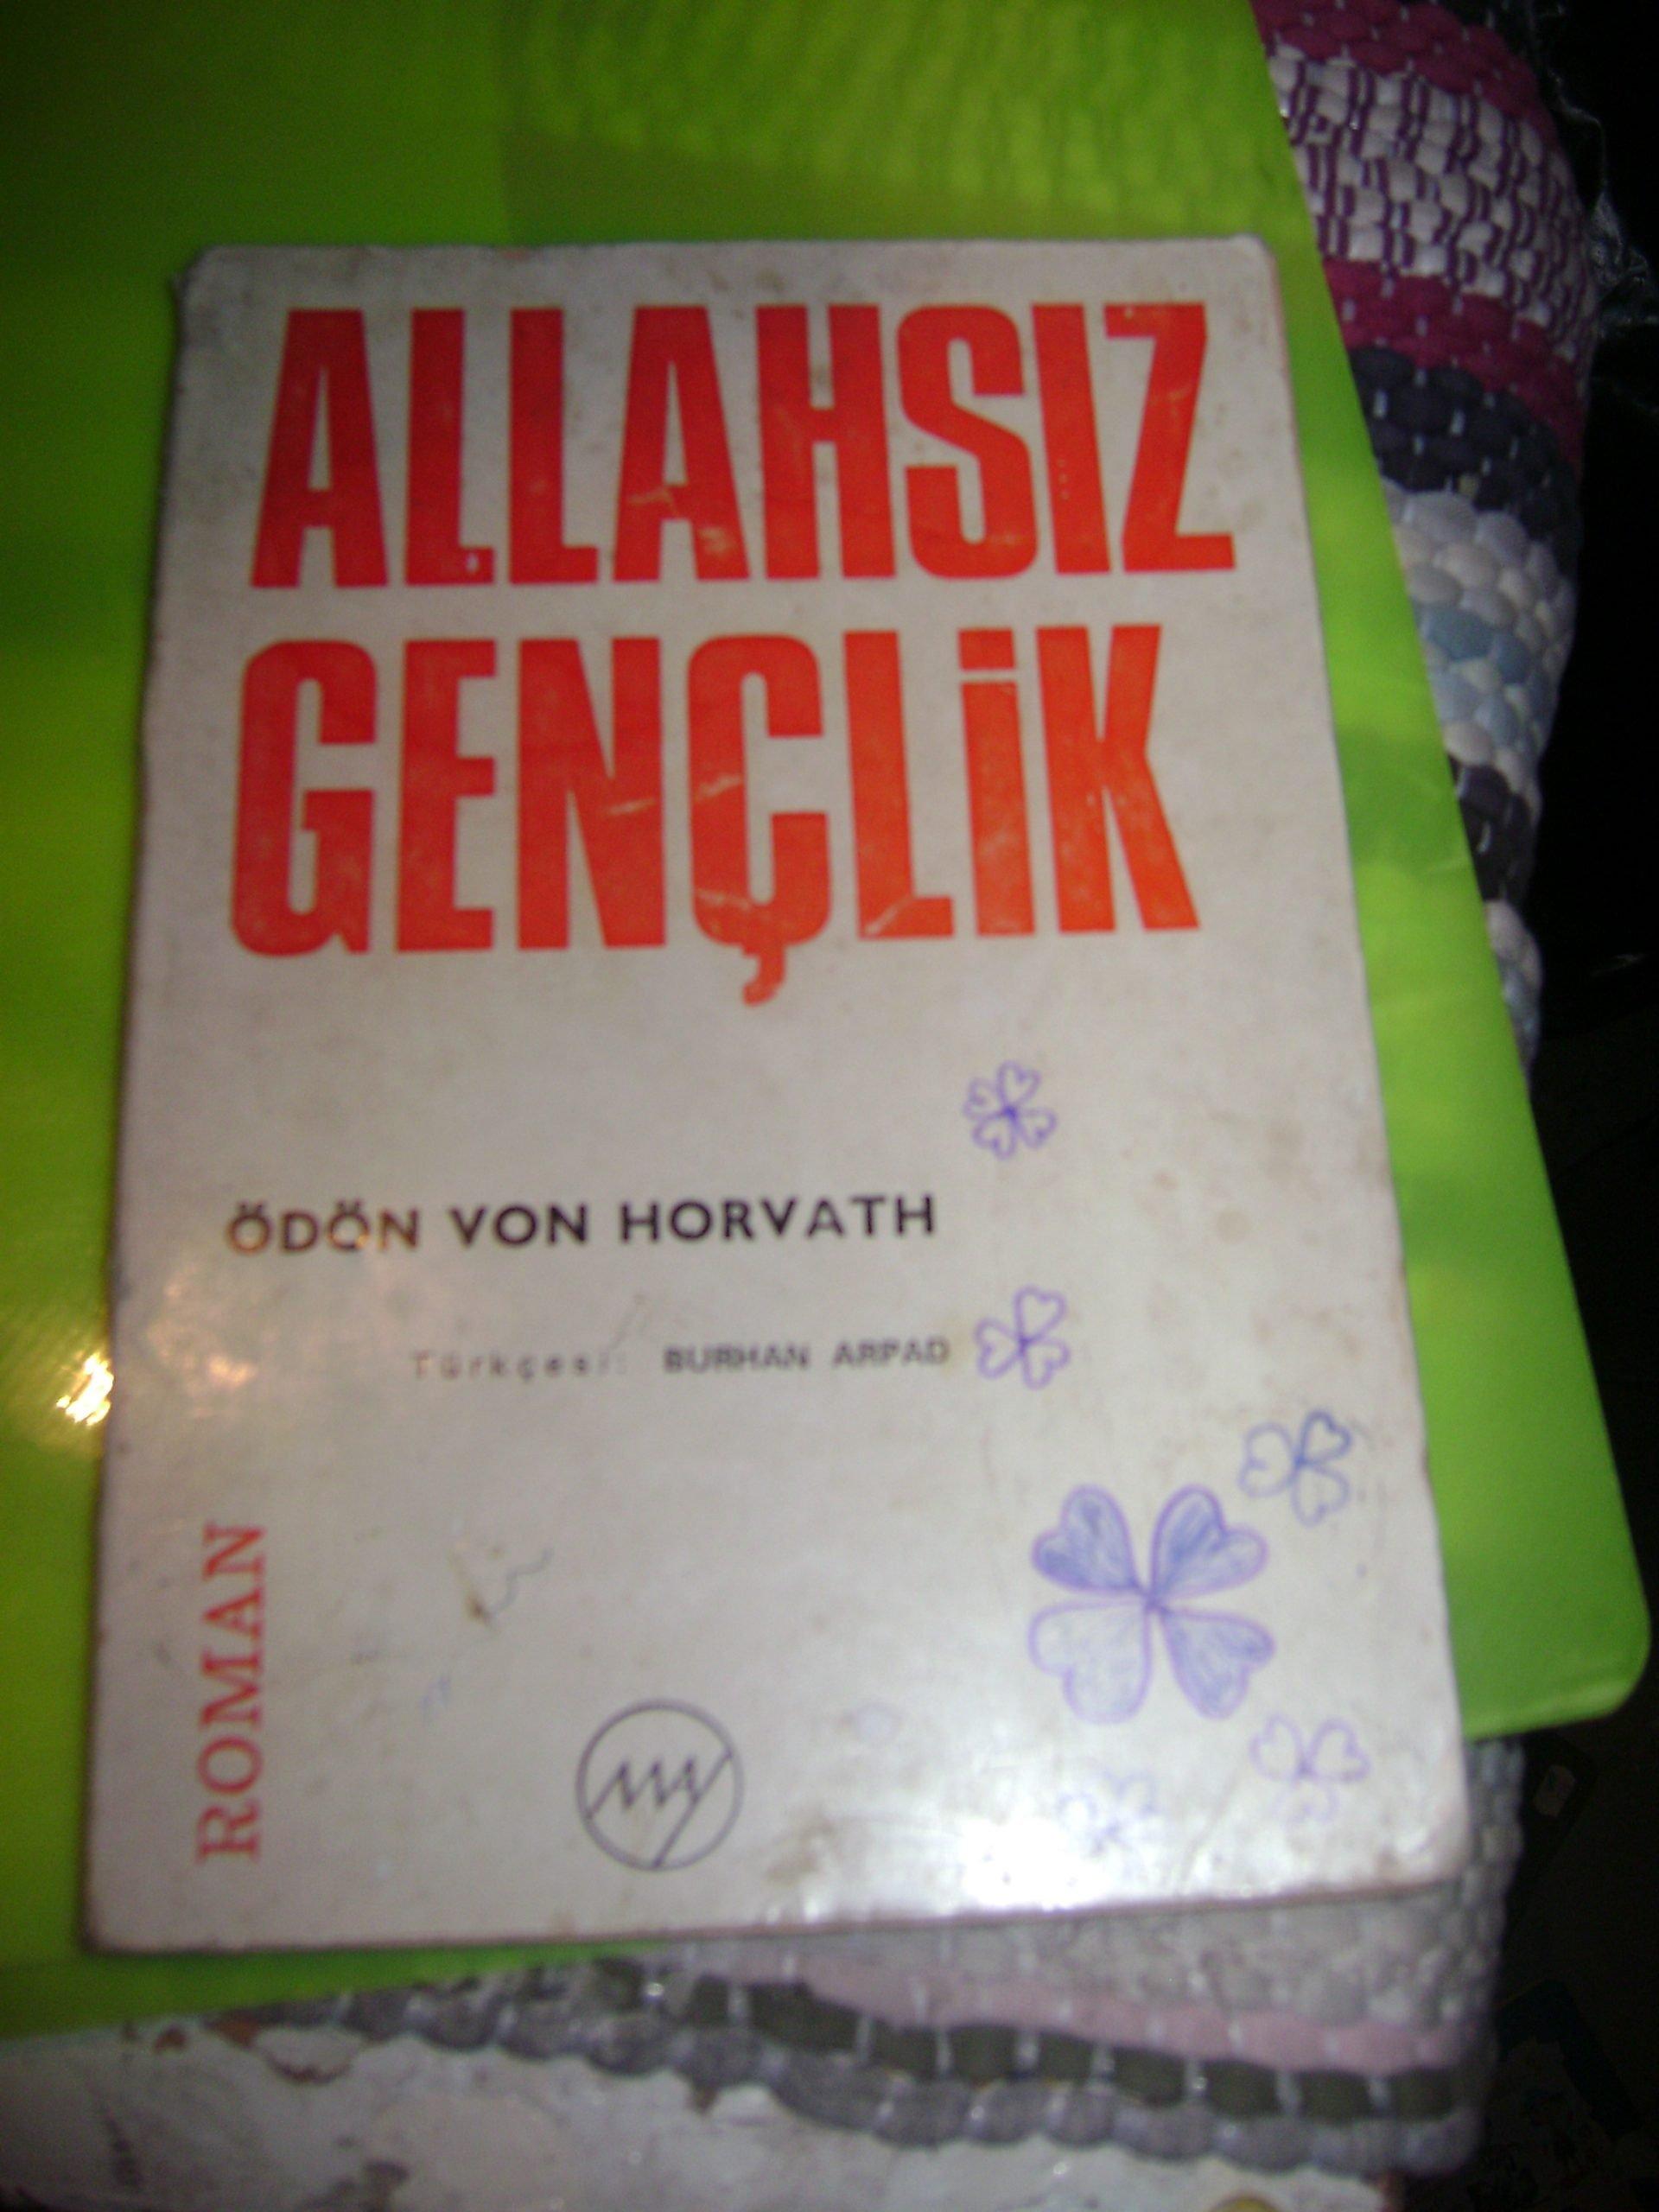 ALLAHSIZ GENÇLİK/ ÖDÖN VON HORVATH/ 10TL